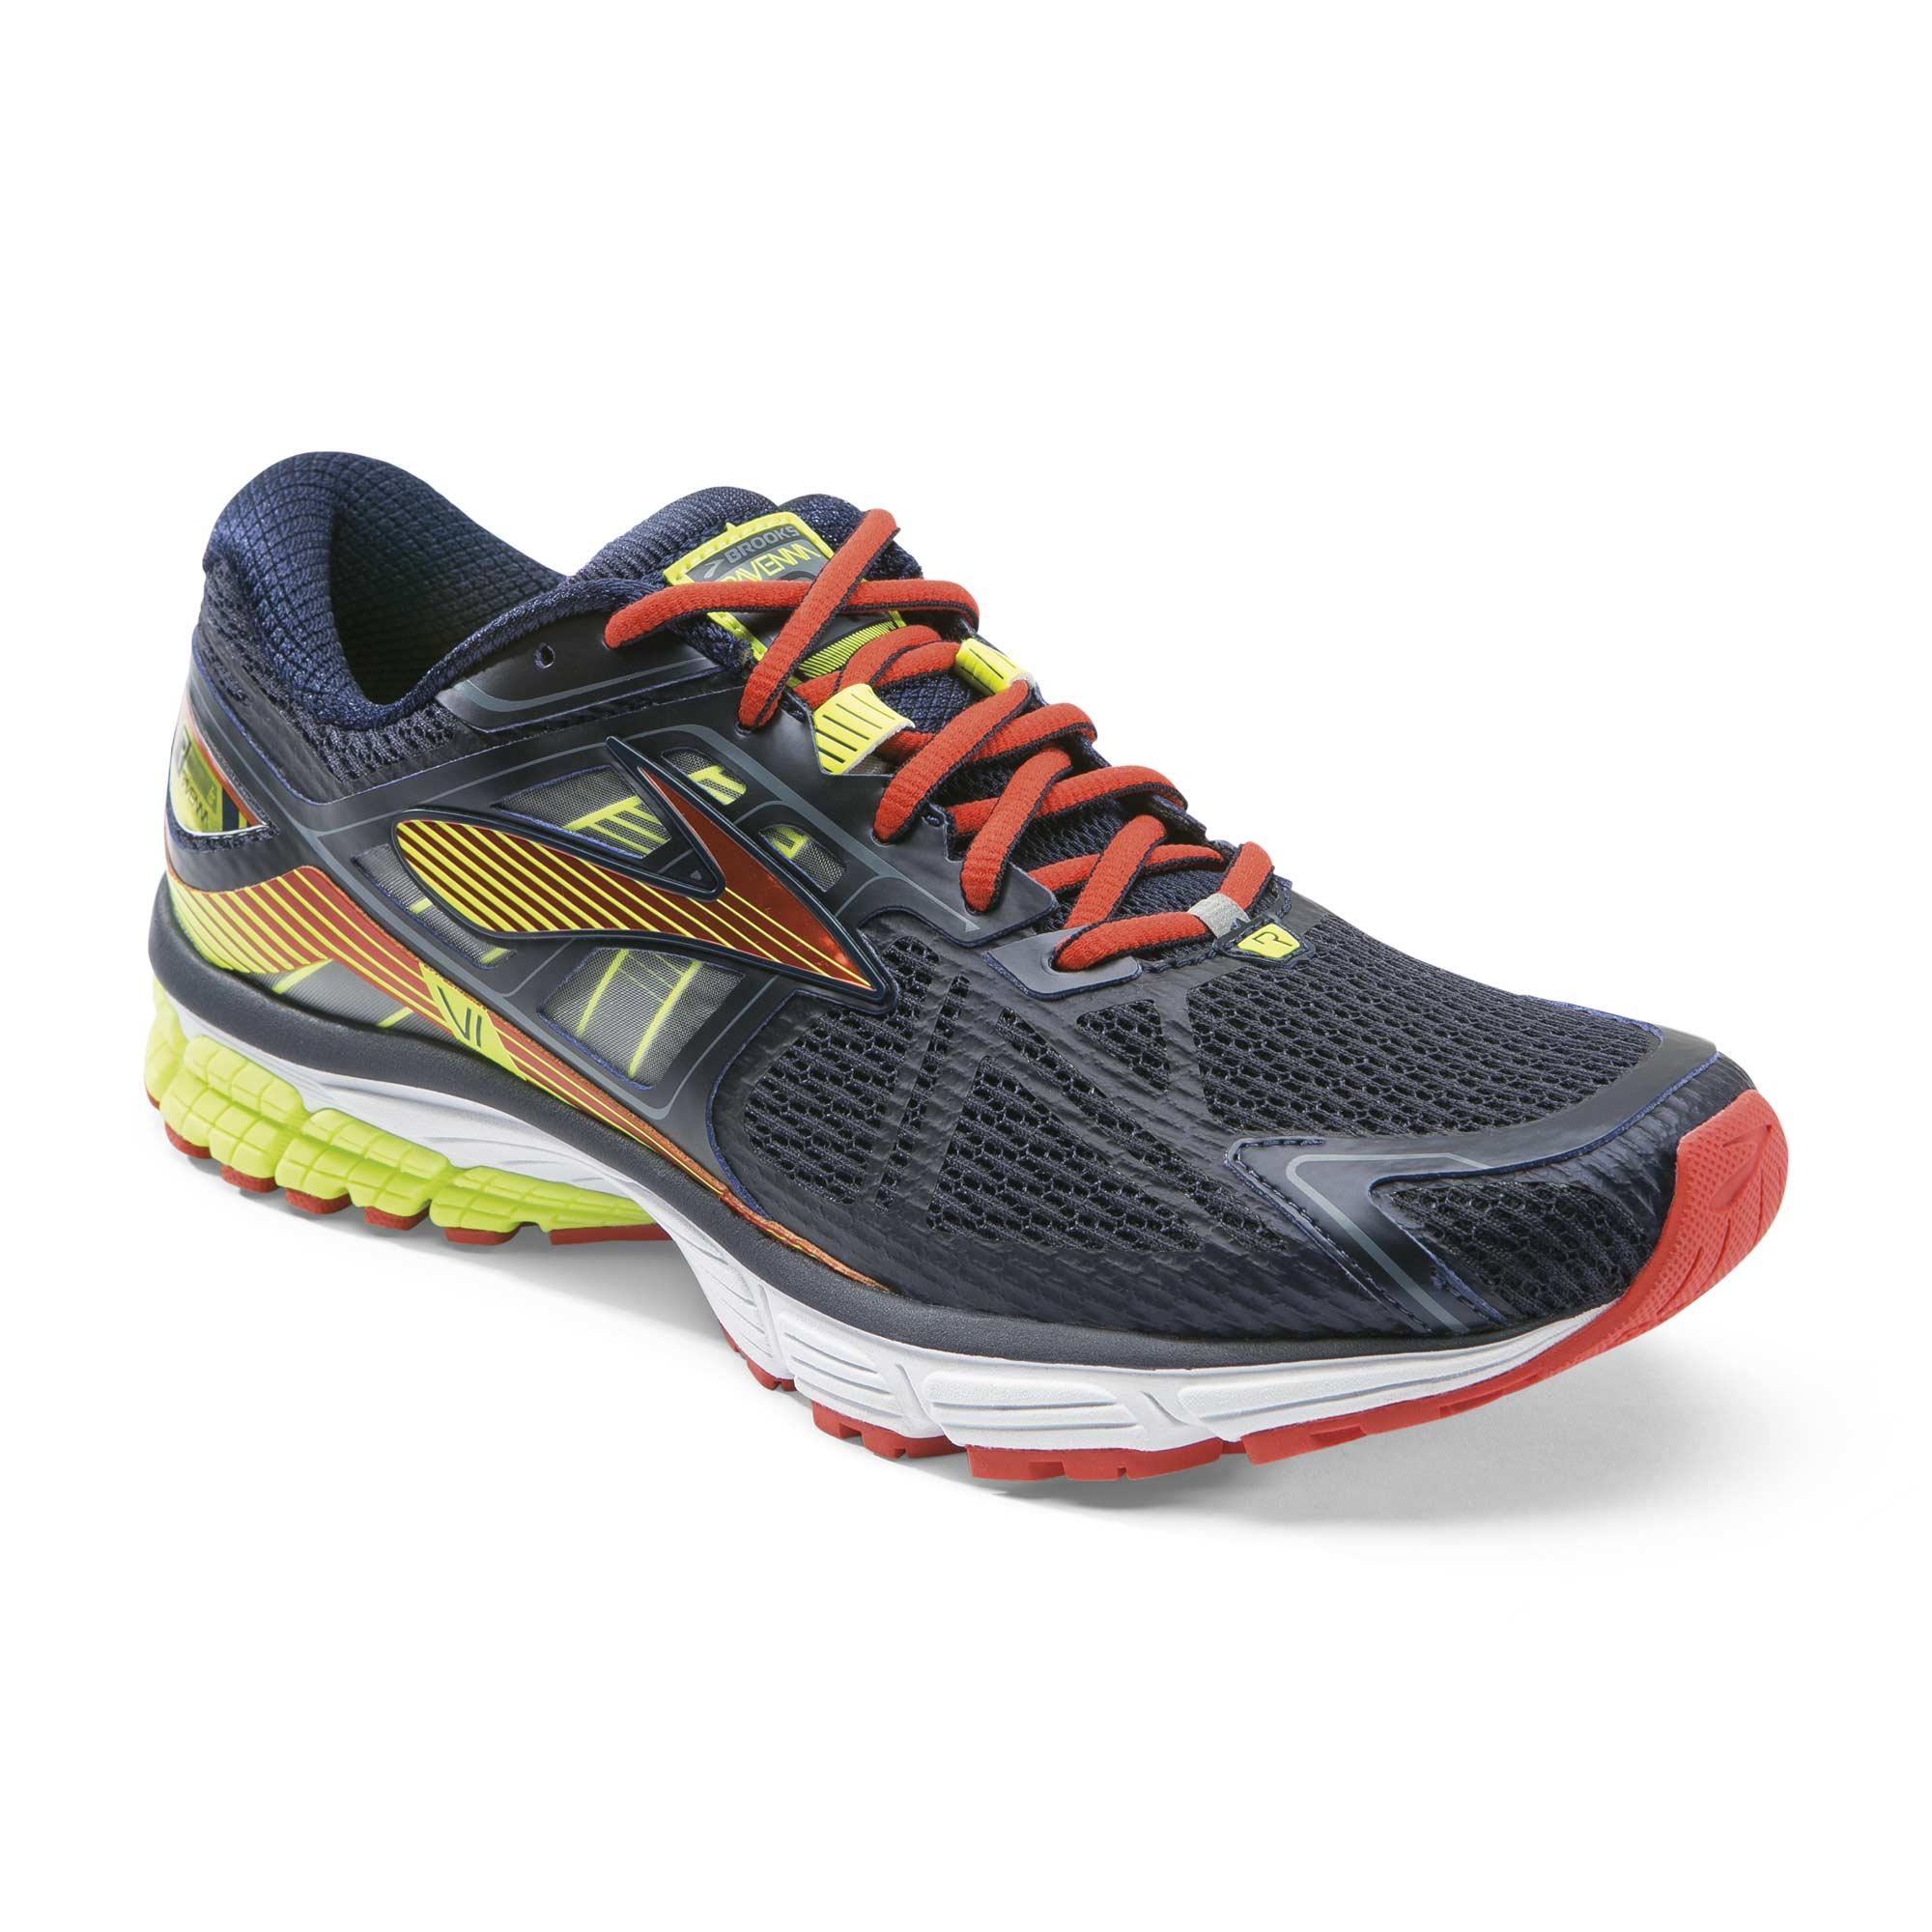 Men's Brooks Ravenna 6 Running Shoes (various colors)  $50 + Free Shipping